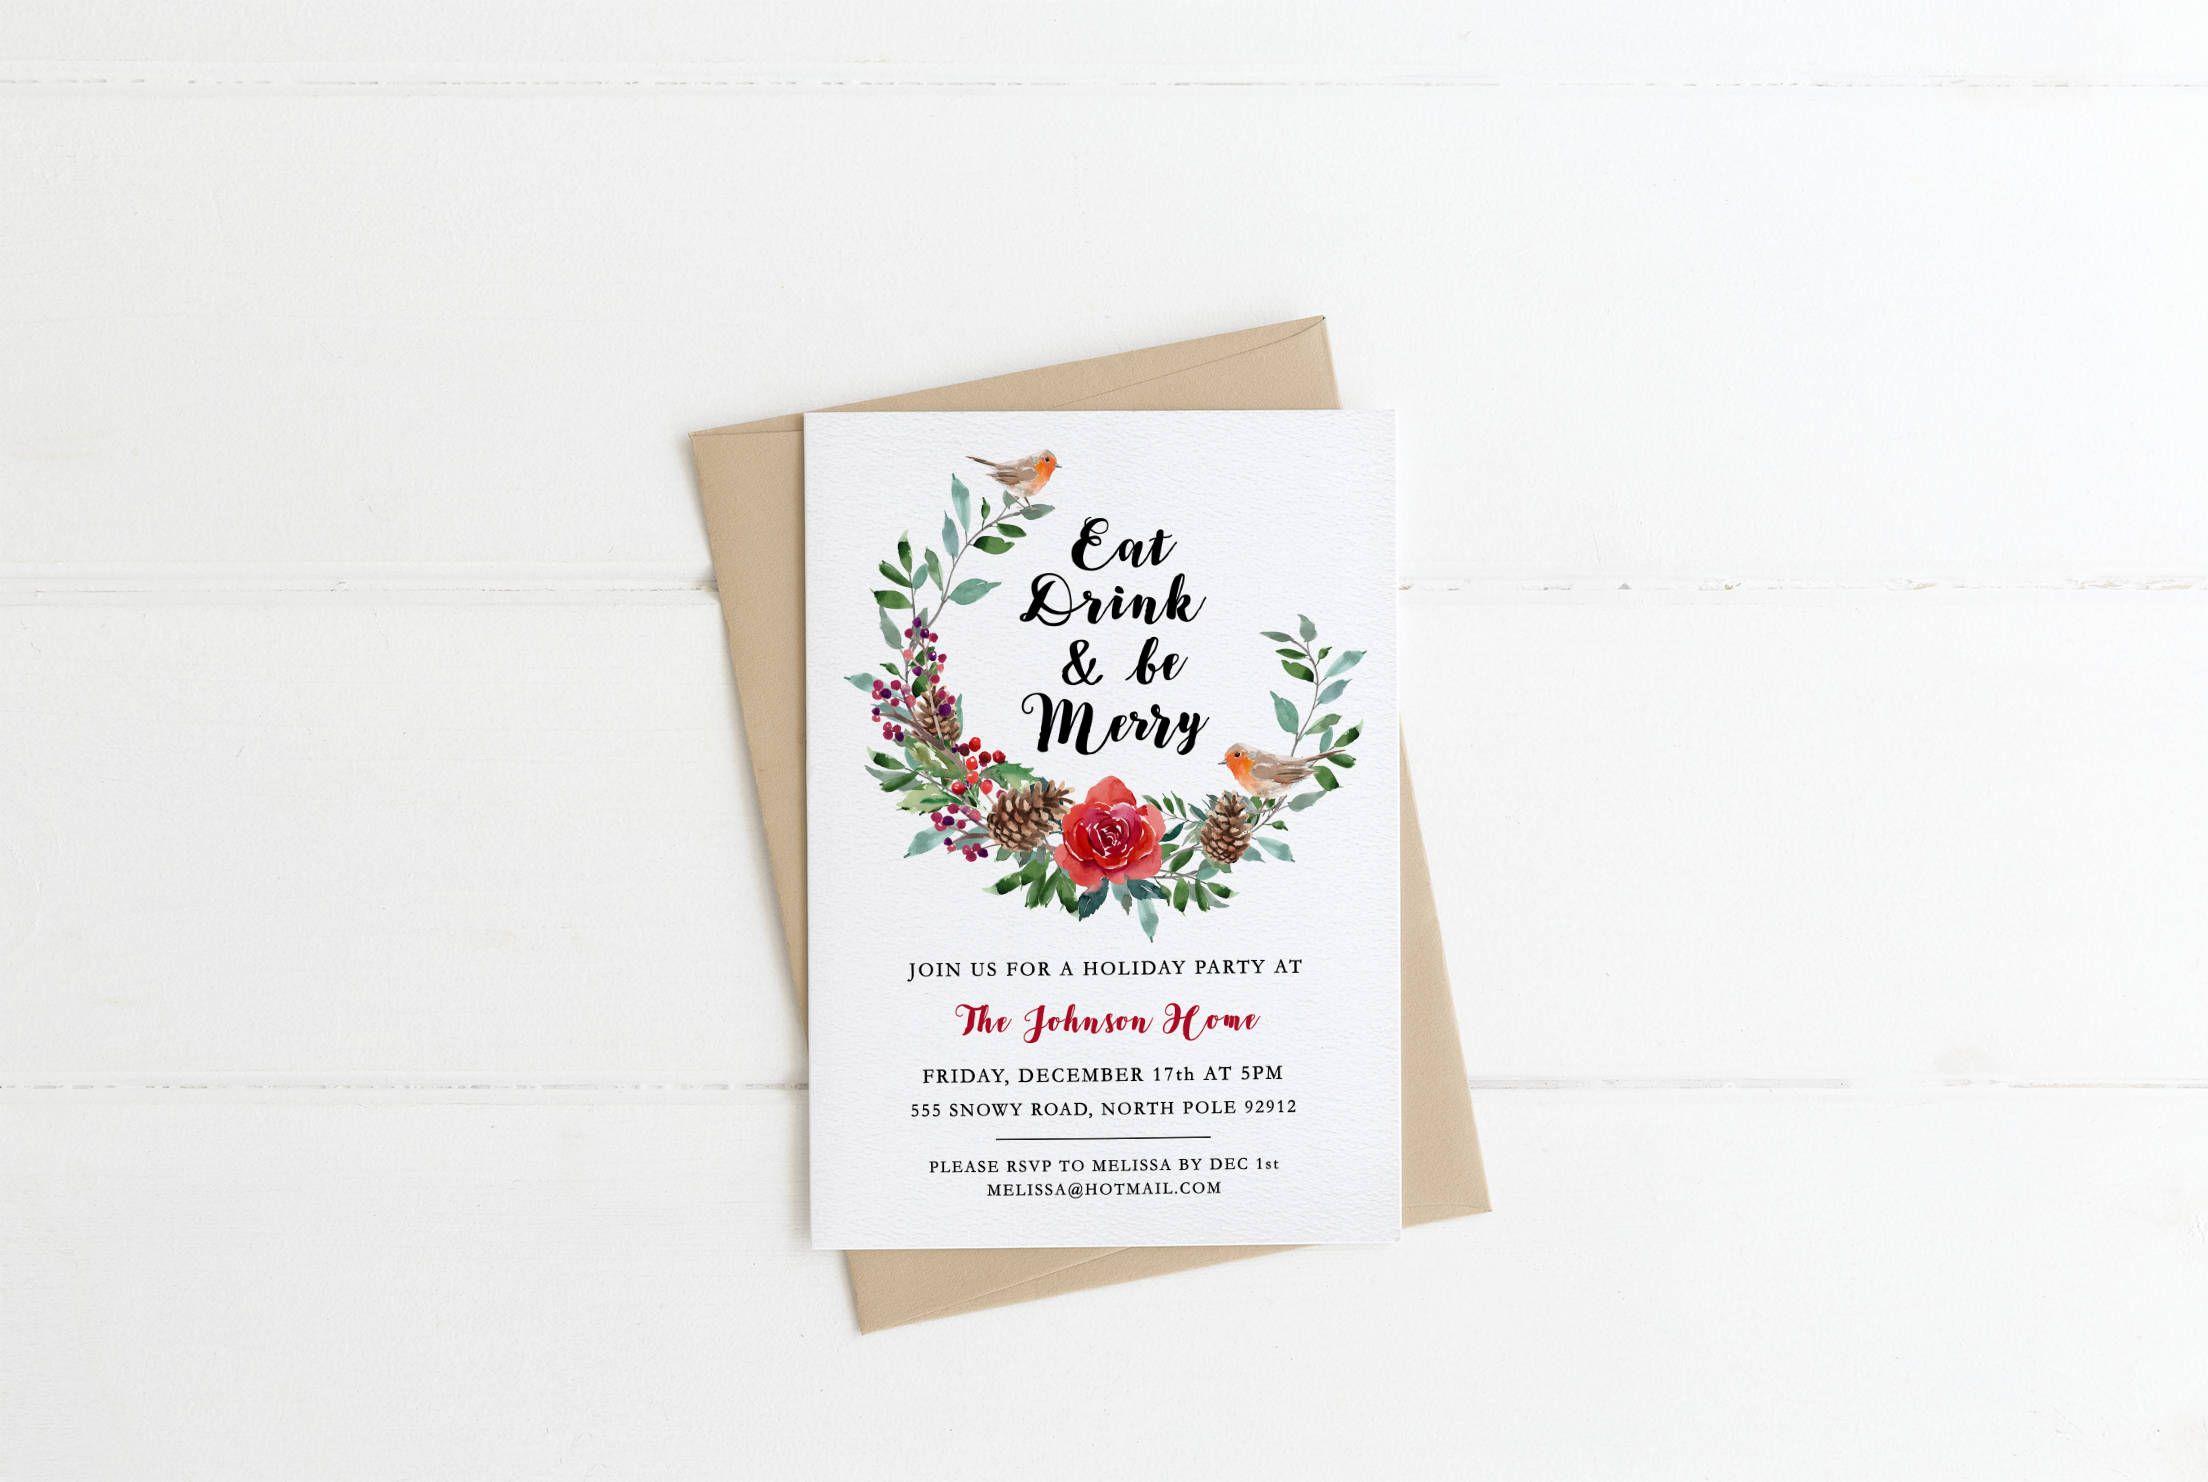 Christmas Party Invitation - Personalized Christmas Invite, Digital ...